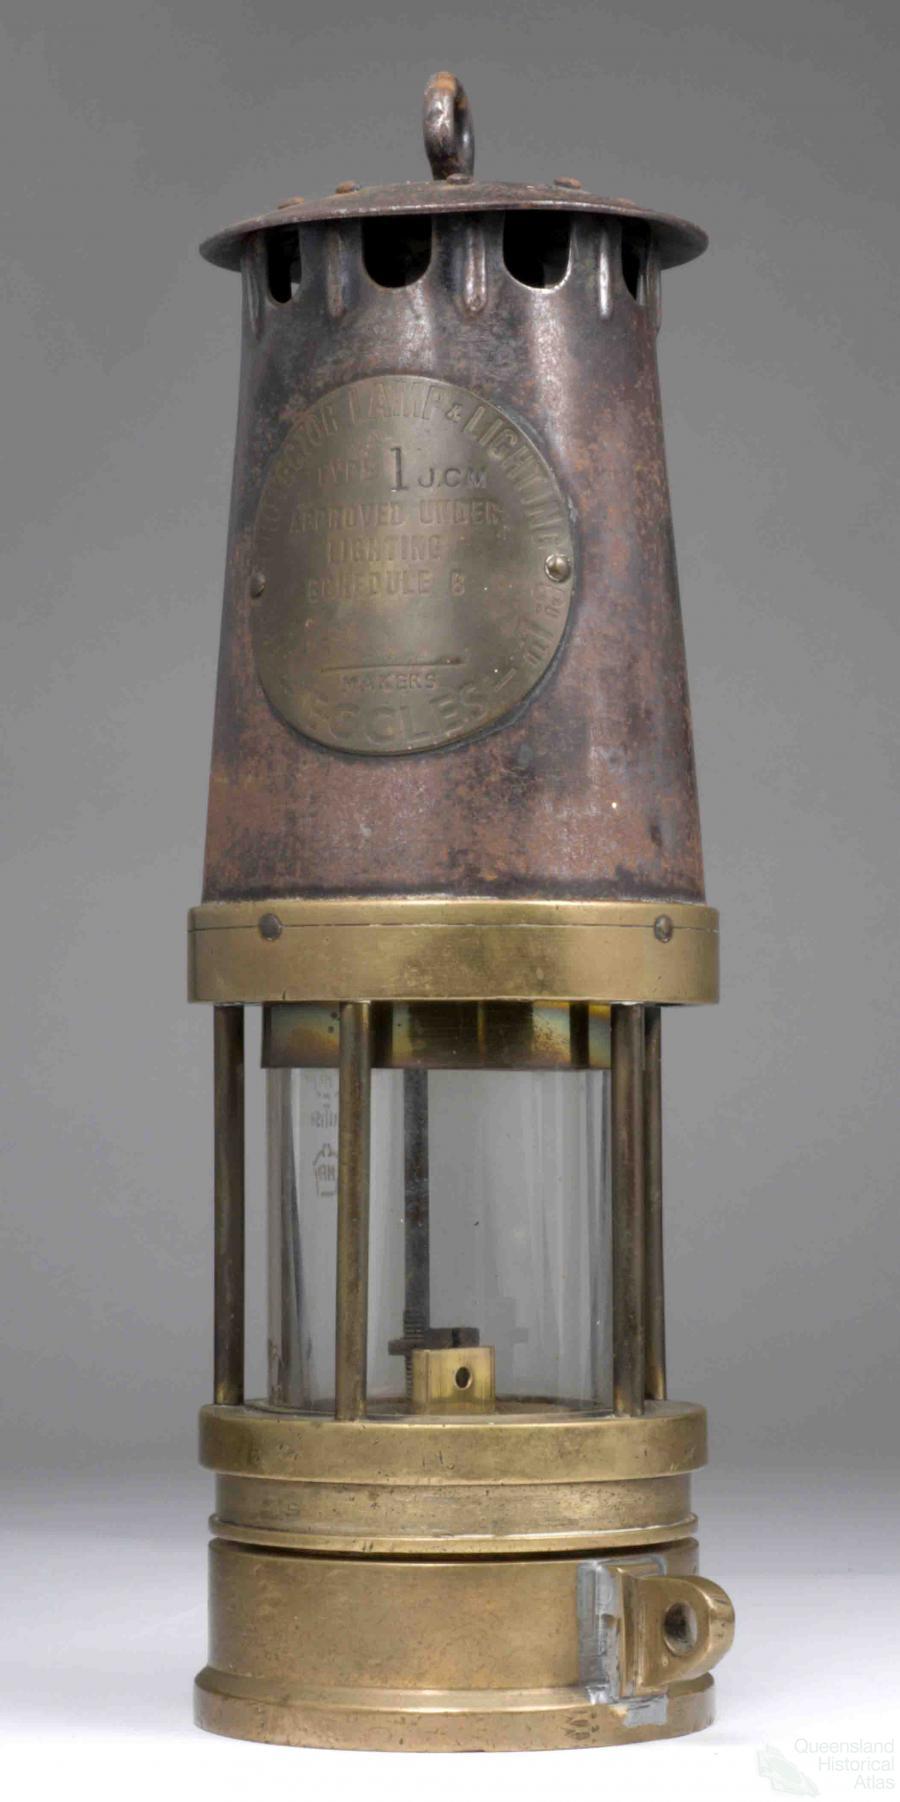 Miner's safety lamp | Queensland Historical Atlas